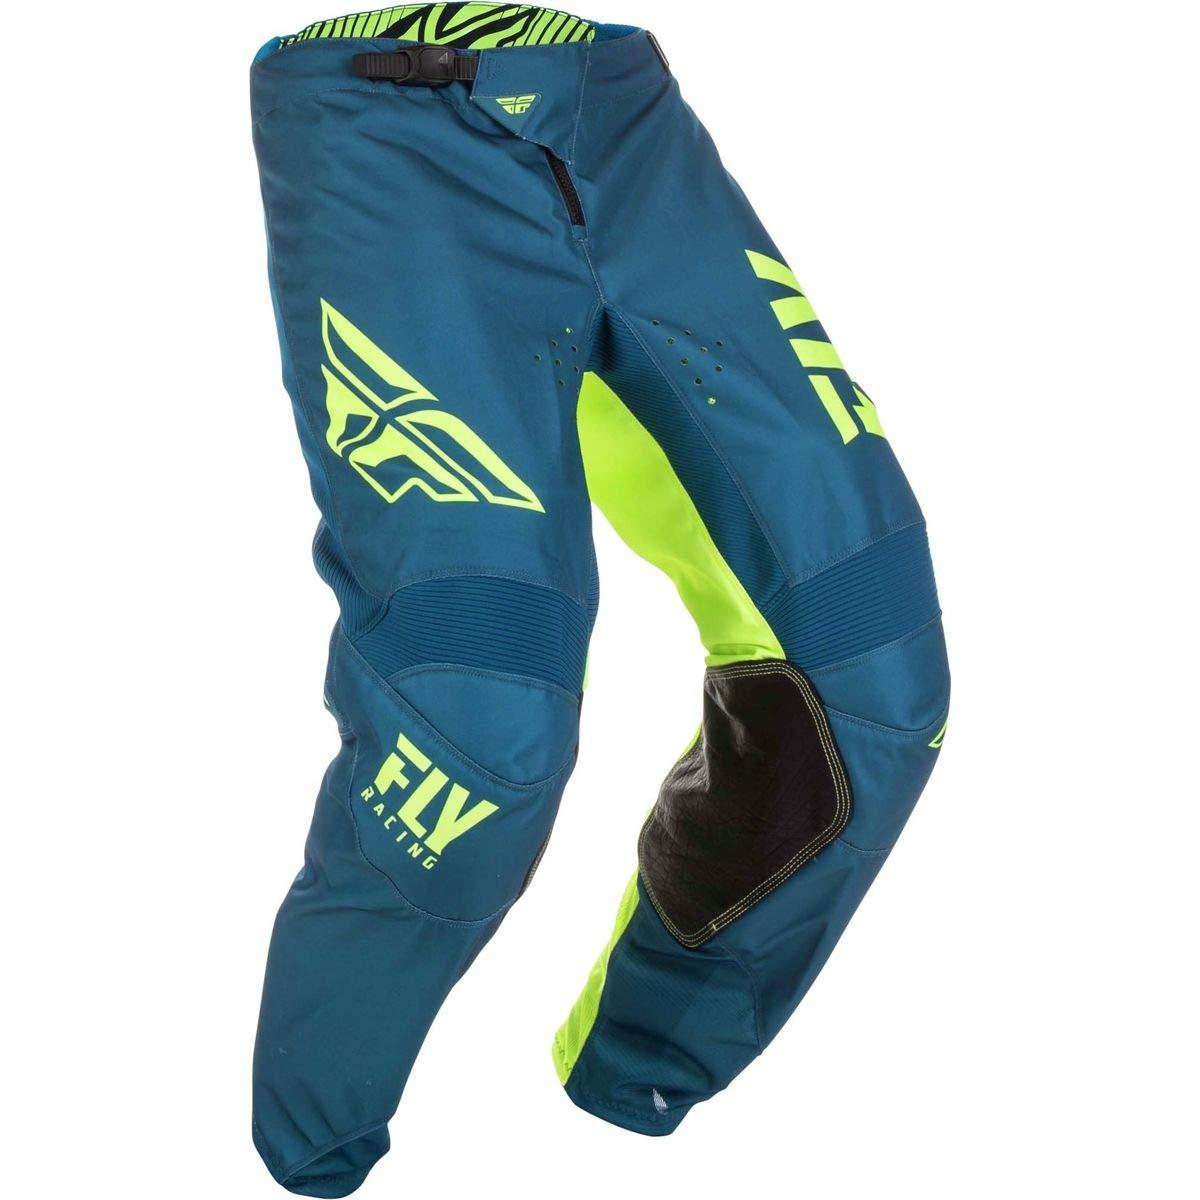 Fly Racing 2019 Youth Kinetic Pants - Shield (26) (Navy/HI-VIZ)